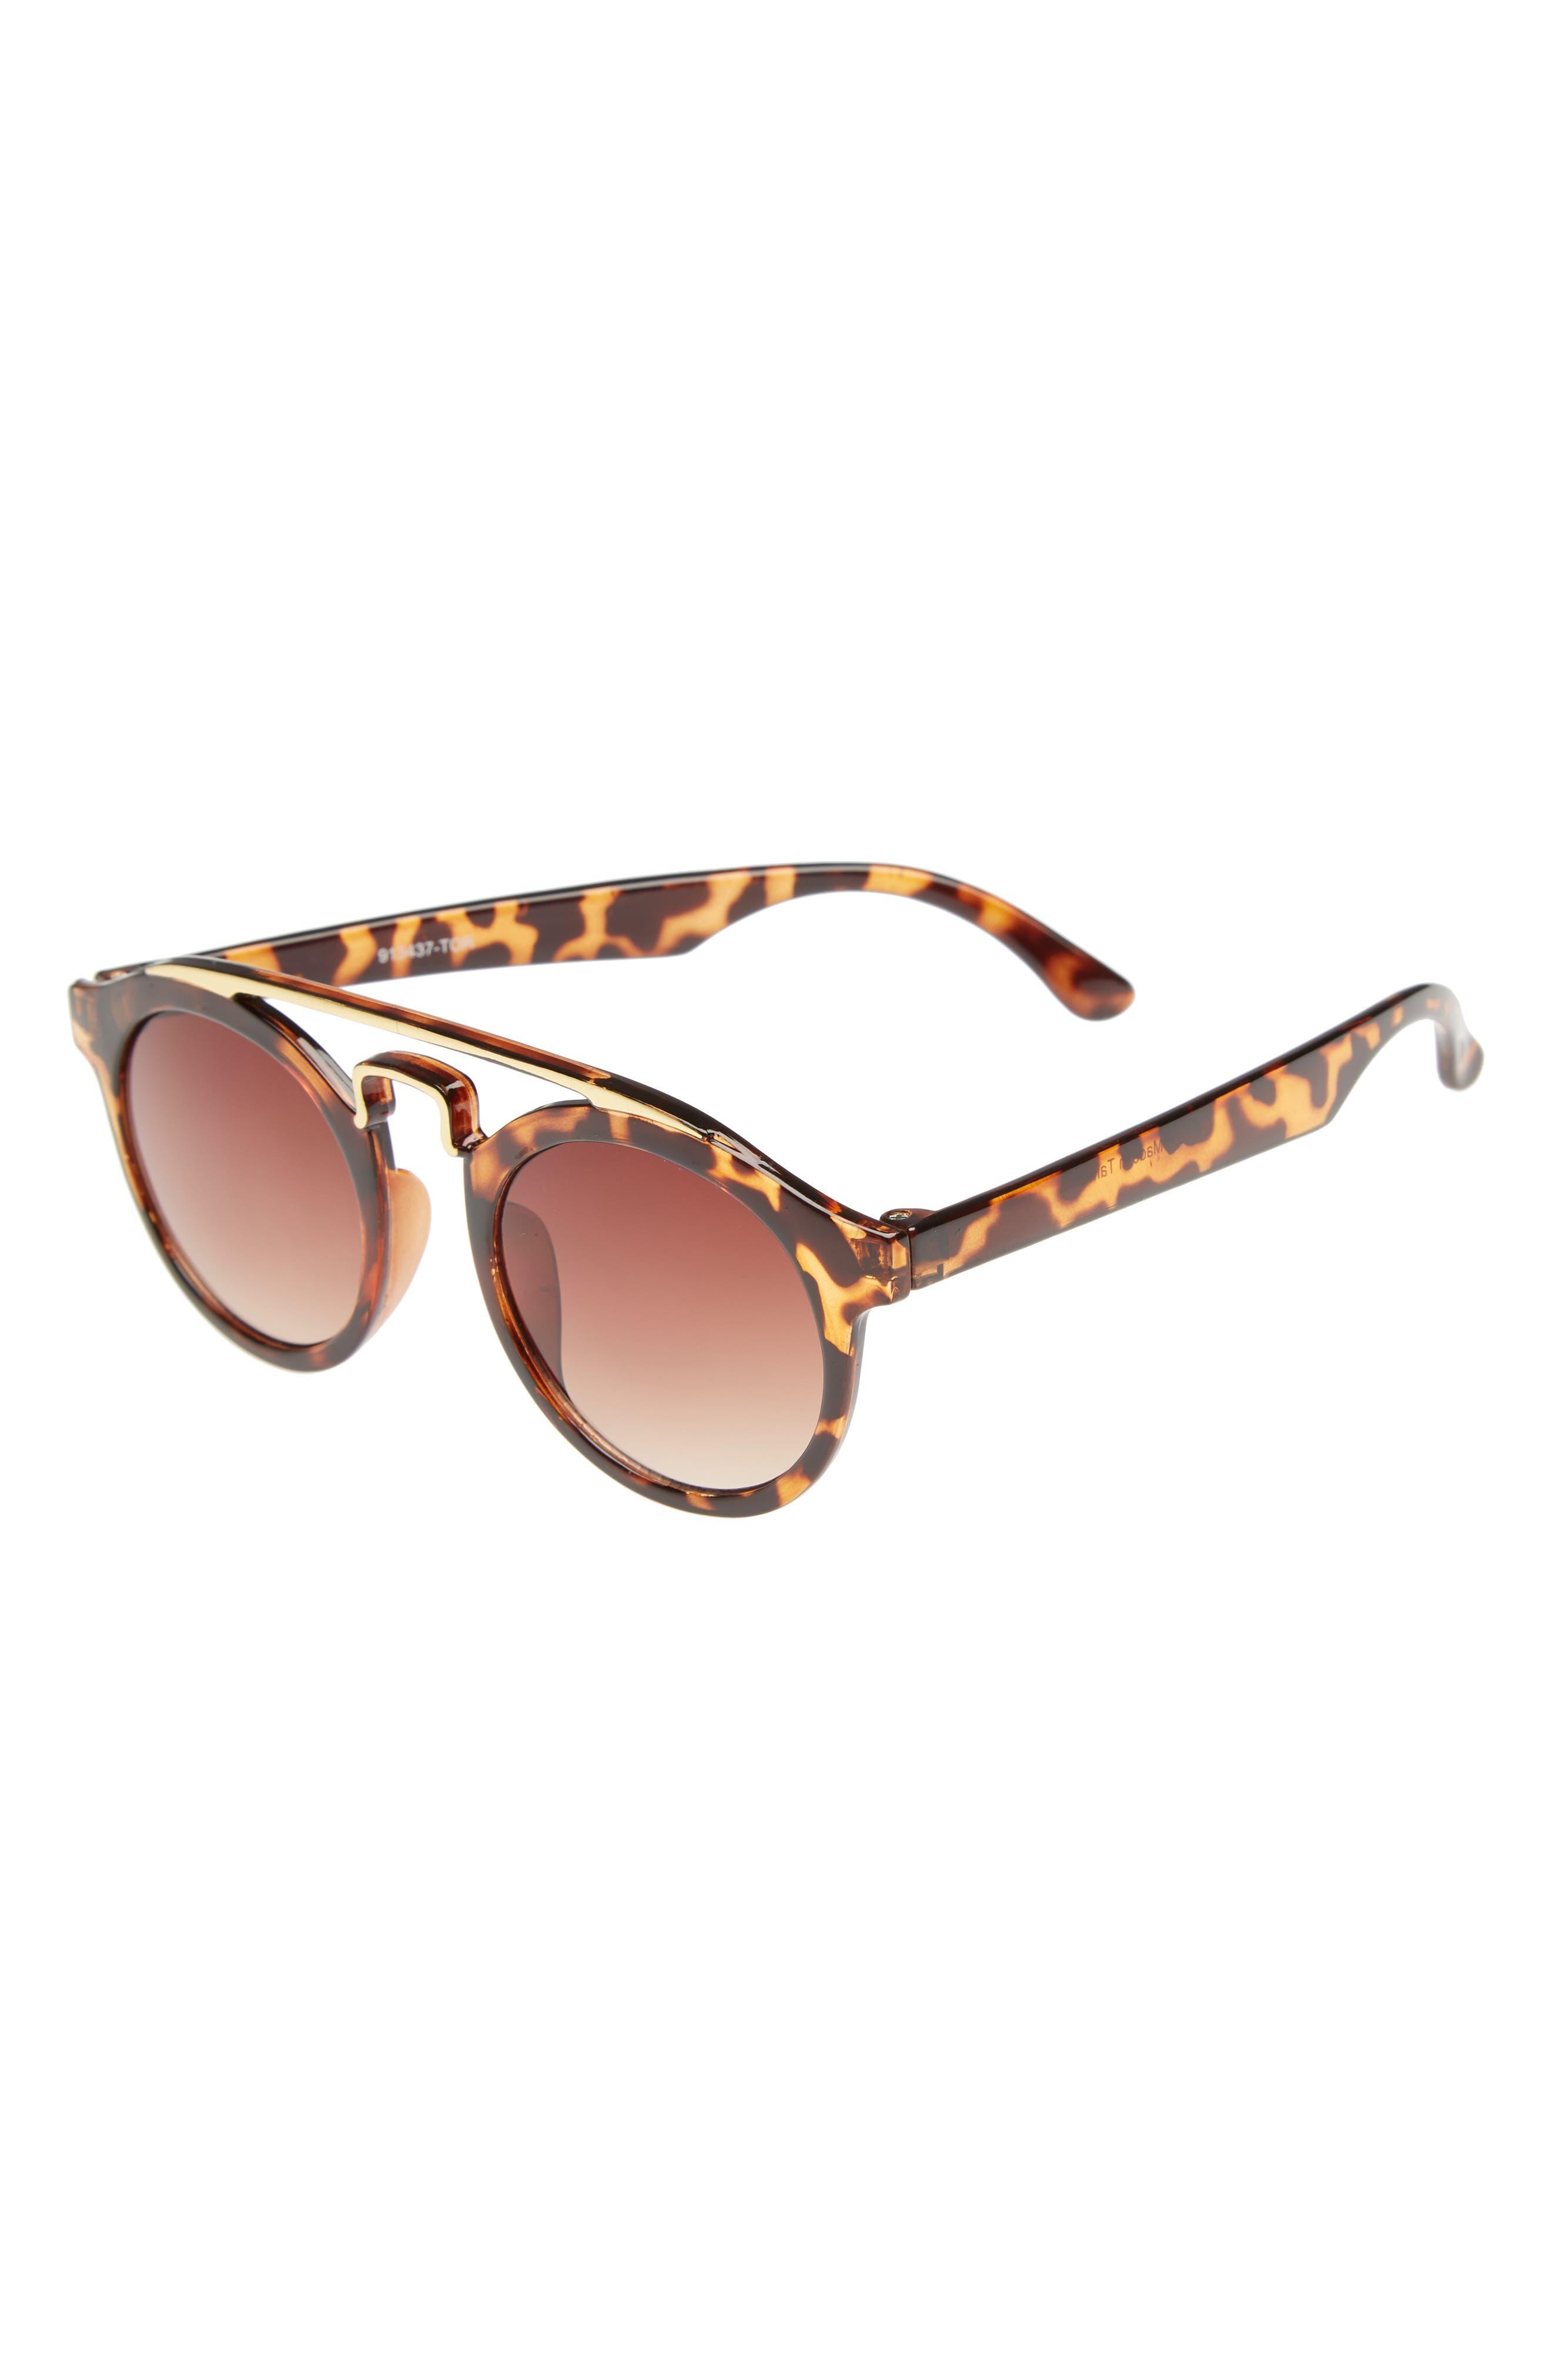 43mm Round Brow Bar Sunglasses,                             Main thumbnail 1, color,                             Brown